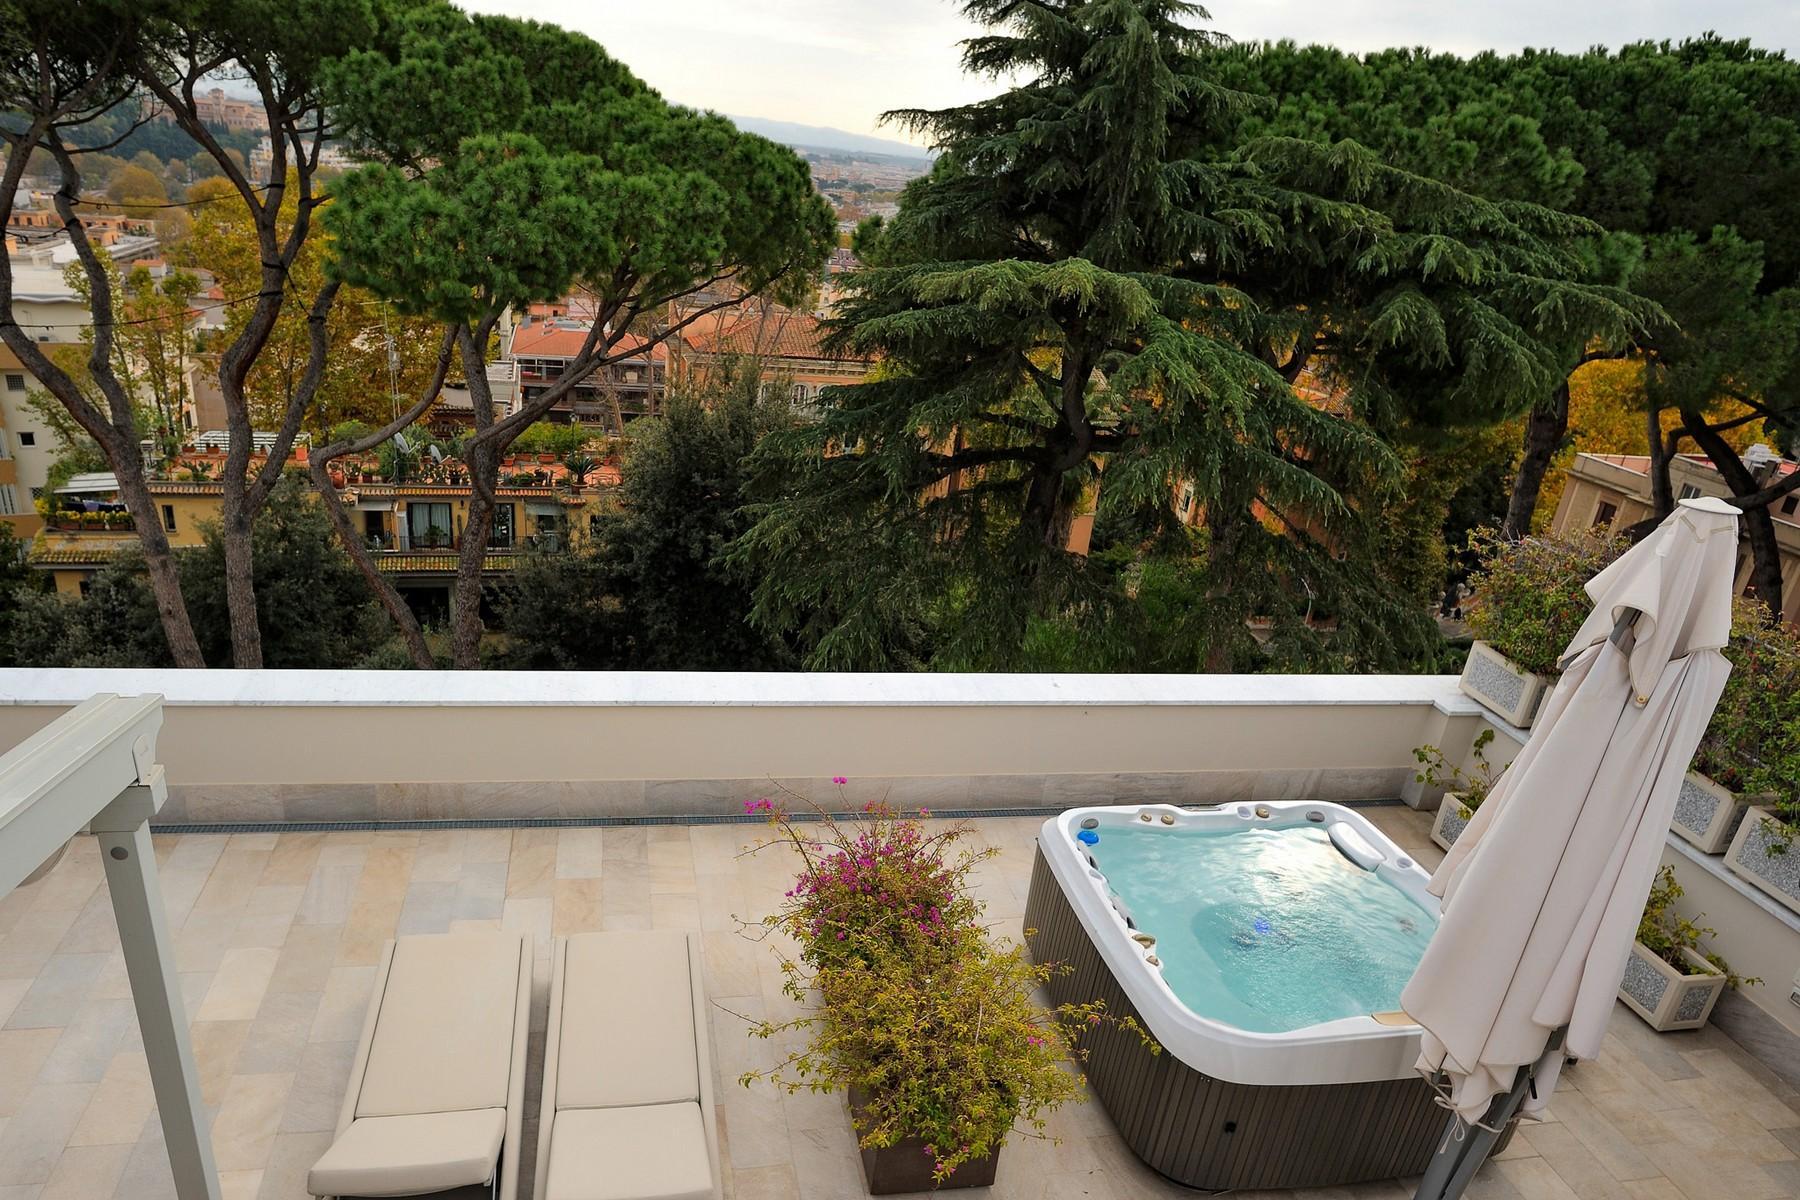 Villa Calandrelli, Charme und Stil im grünen Herzen Roms - 6